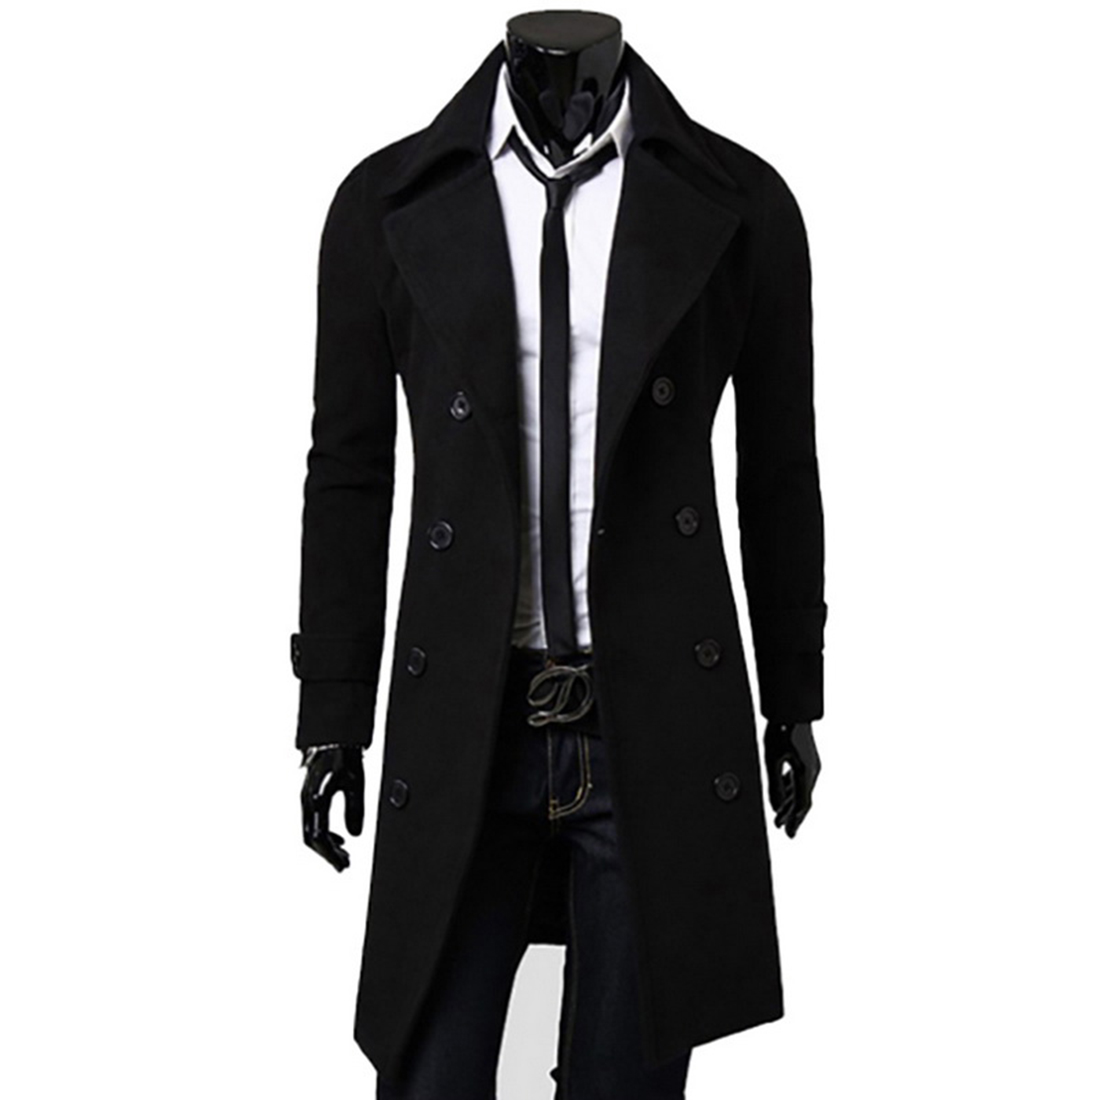 Luxury Men Winter Warm Long Coat Casual Fleece Trench Coat Men Thick Outwears Trench Jacket 2019 Men Clothes Slim Abrigo Hombre